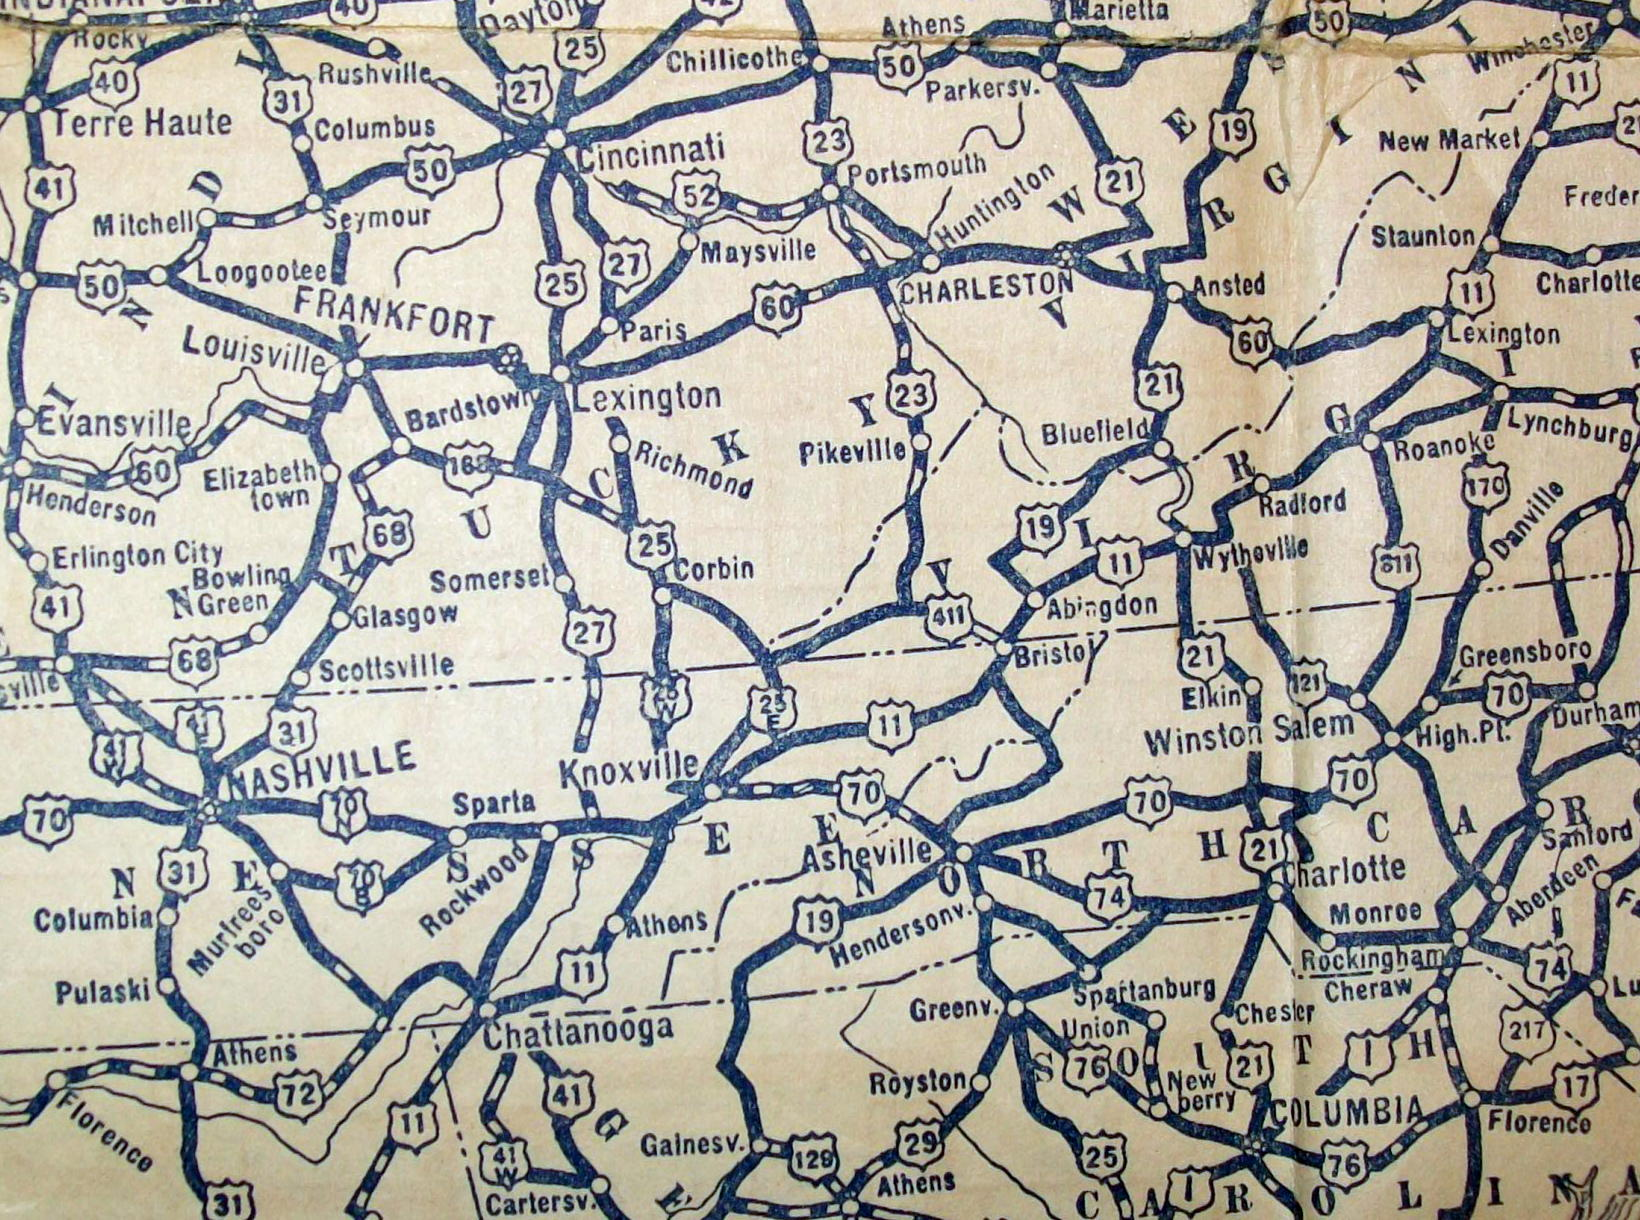 57 Southeast Us Road Map 1931 Alliance Magazine - Southeast-us-road-map